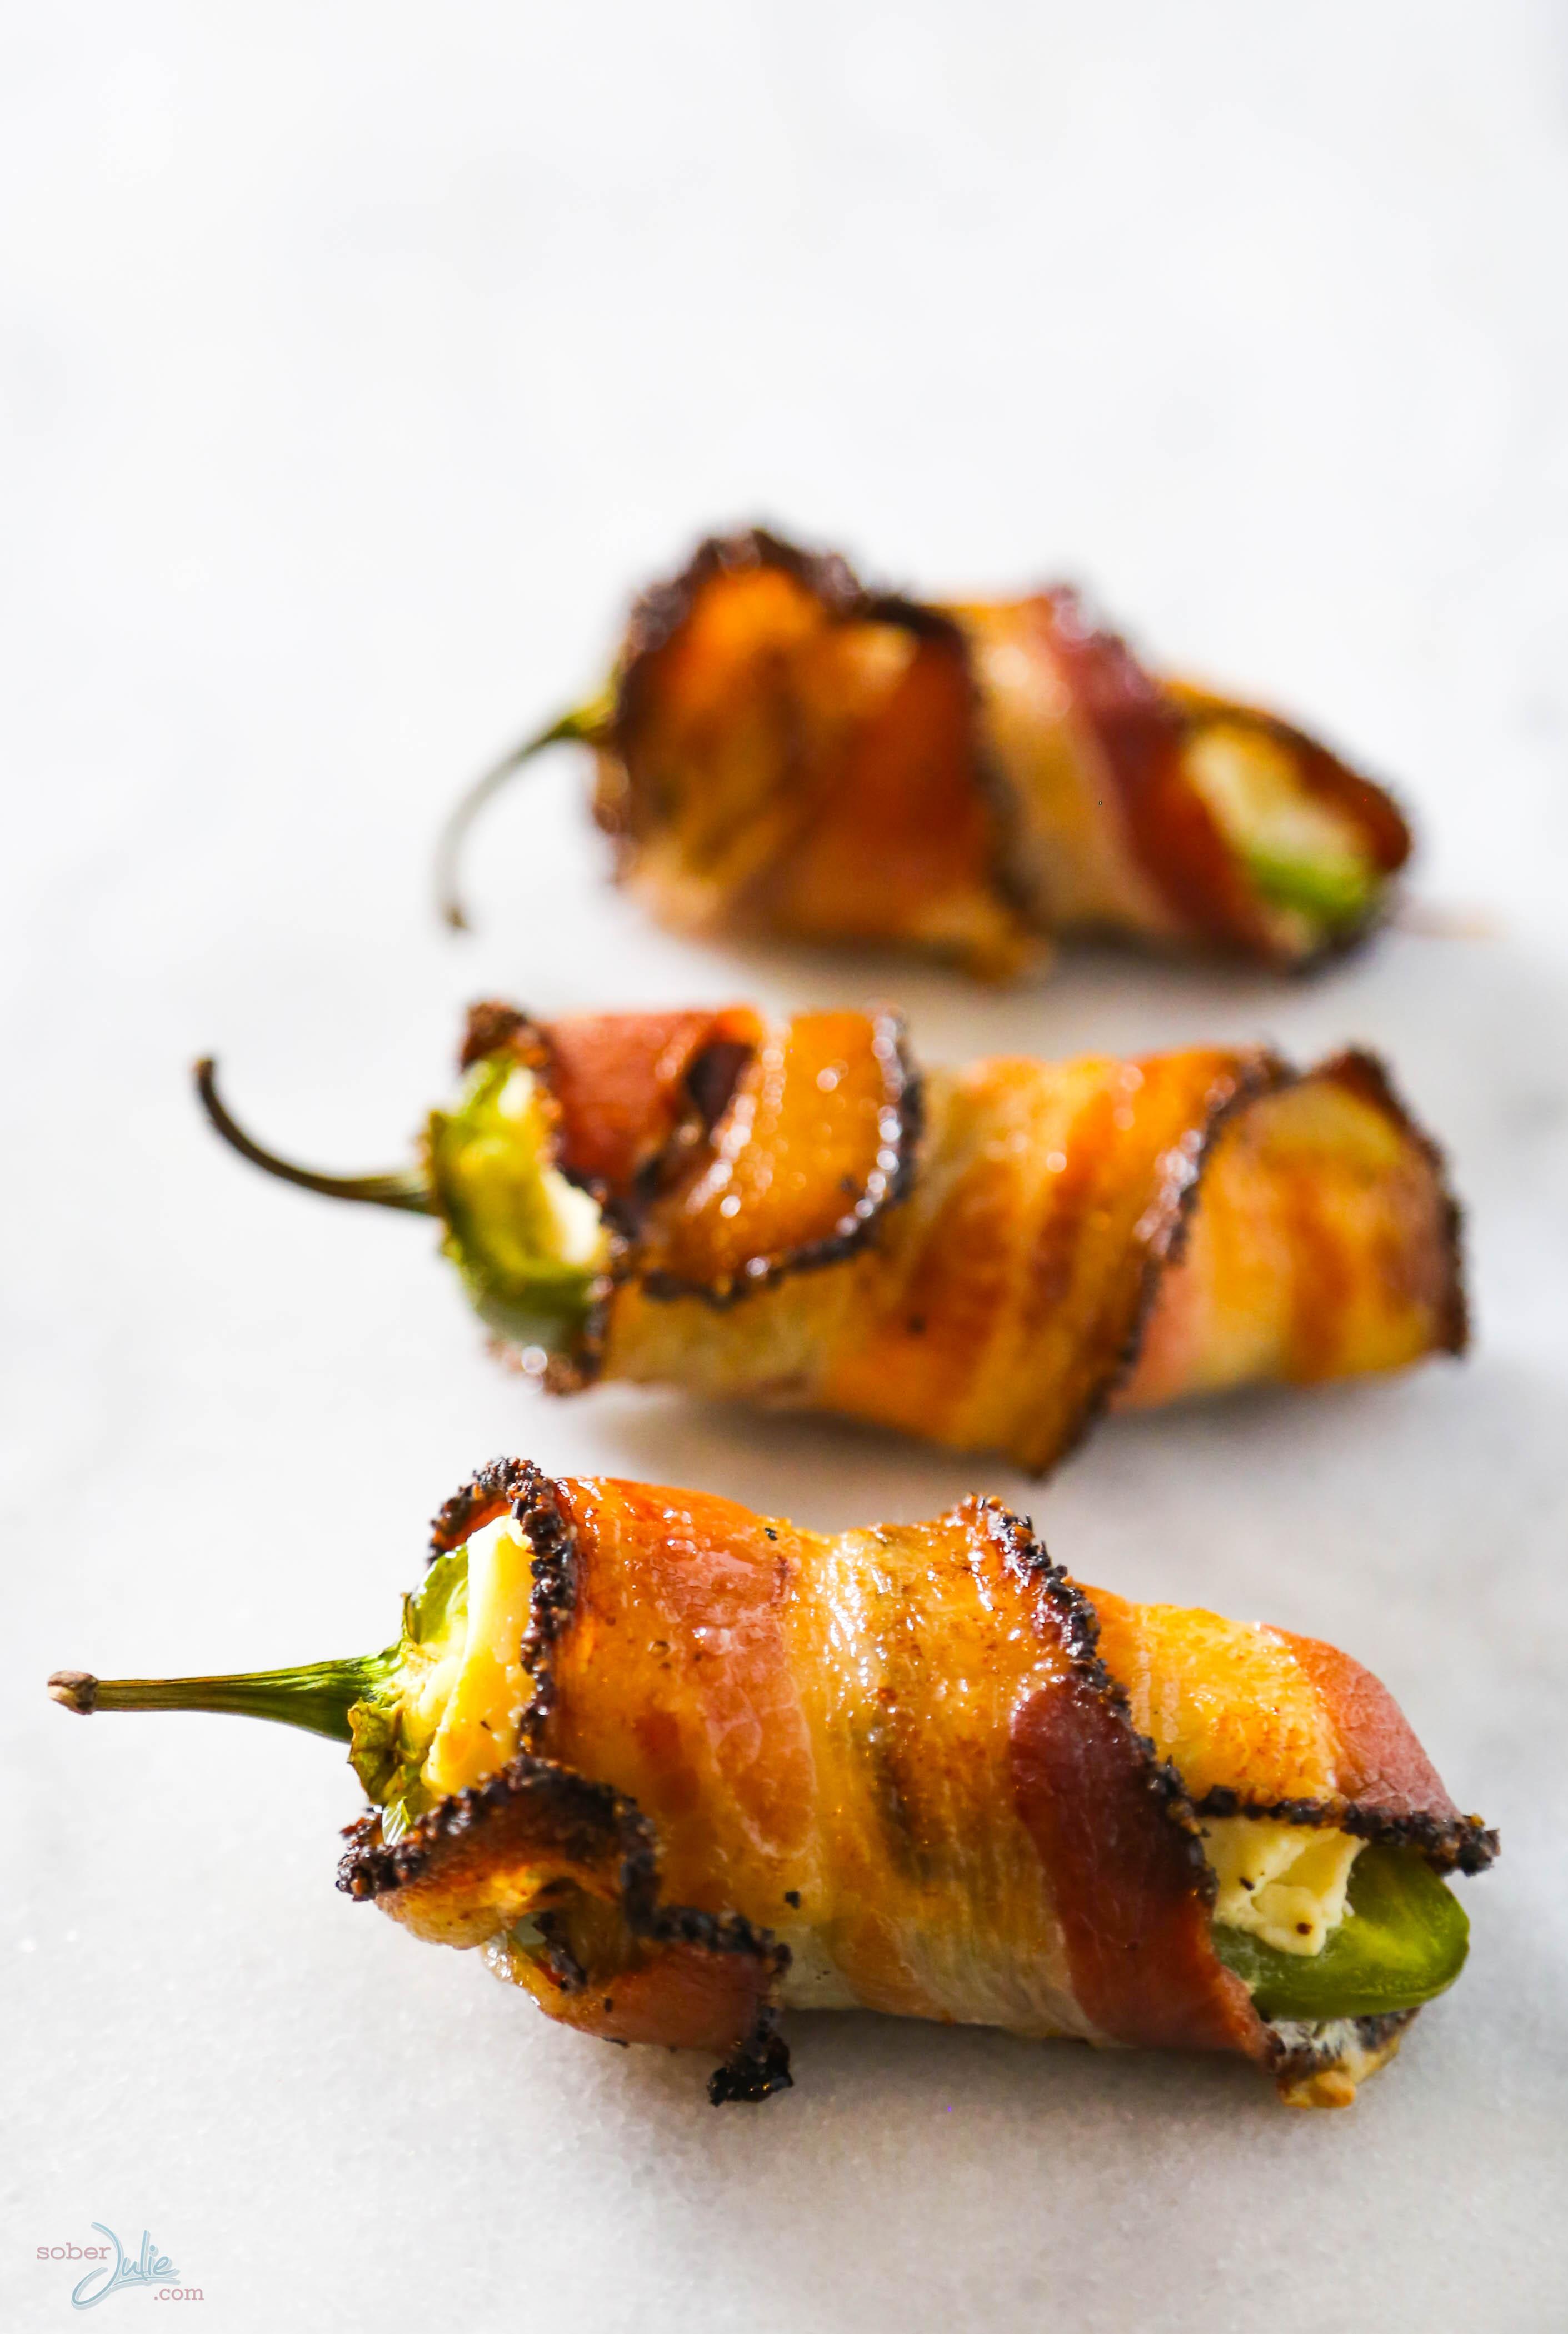 jalapeno-popper-bacon-wrapped-appetizer-recipe